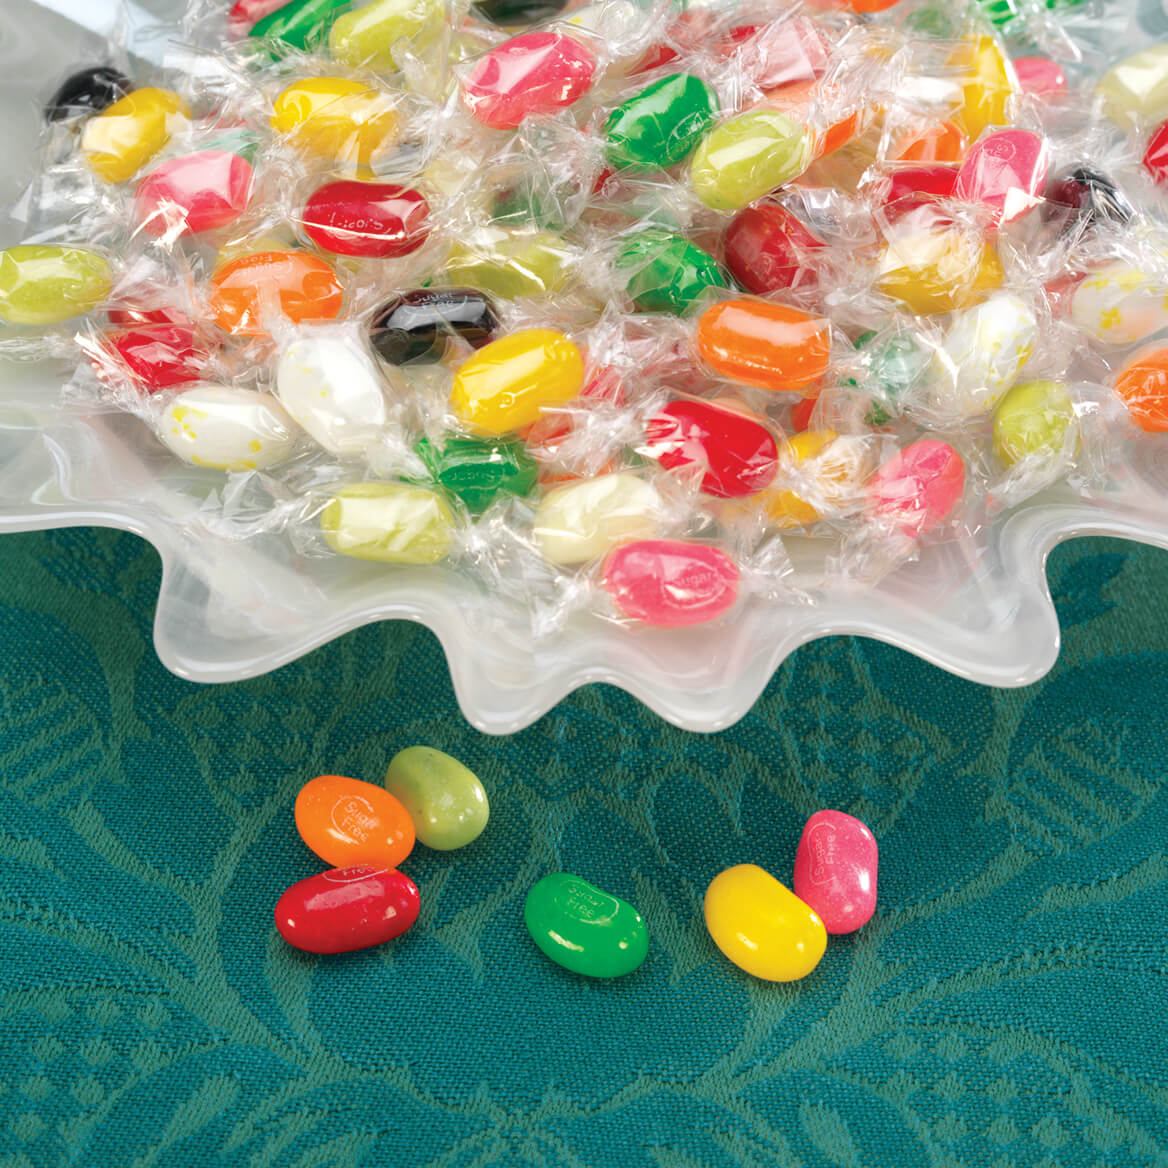 Gourmet Jelly Beans 40 Oz Gimbals Gourmet Jelly Beans Miles